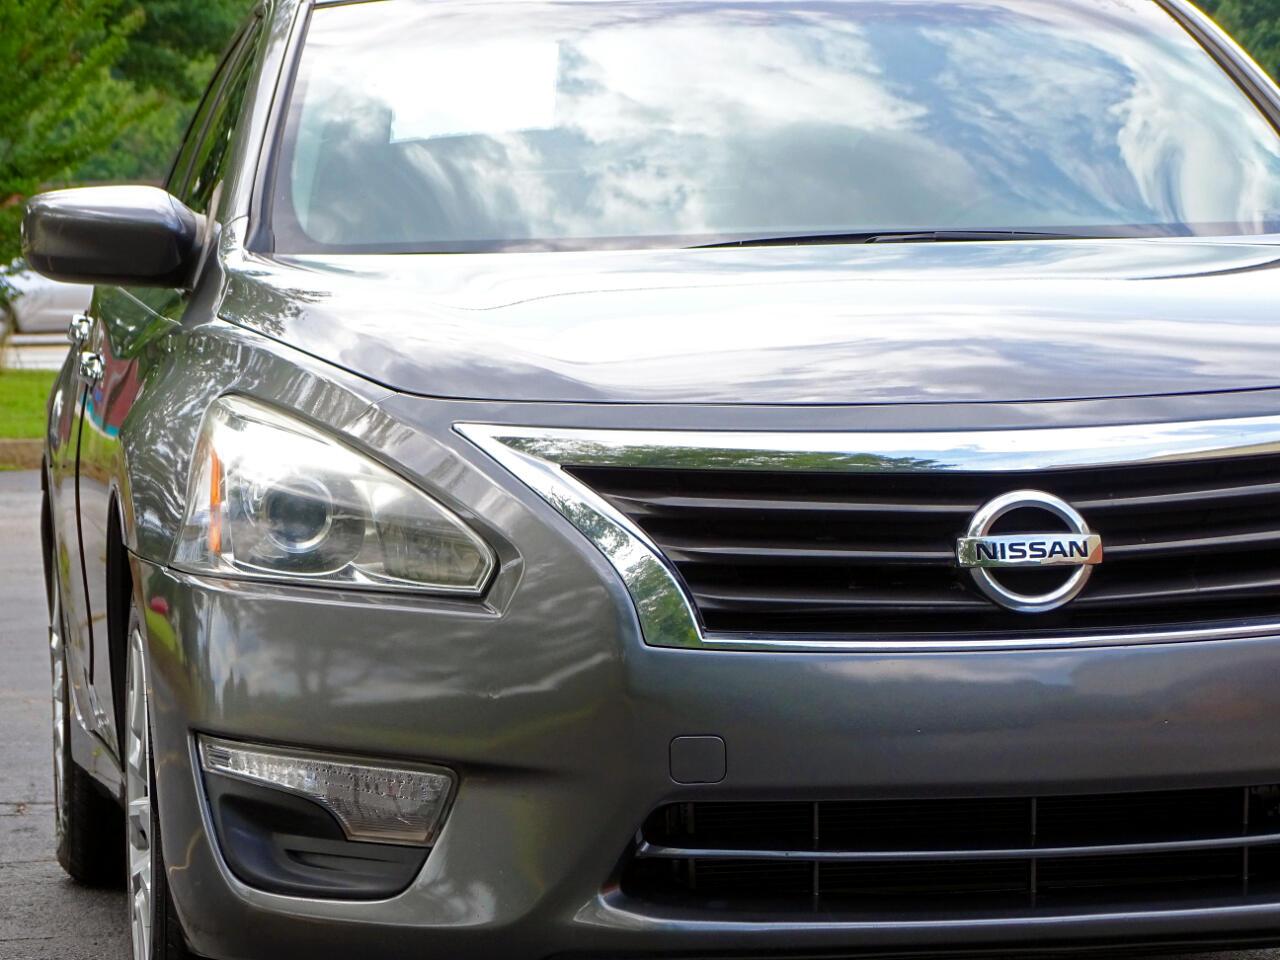 2015 Nissan Altima 4dr Sdn I4 2.5 S